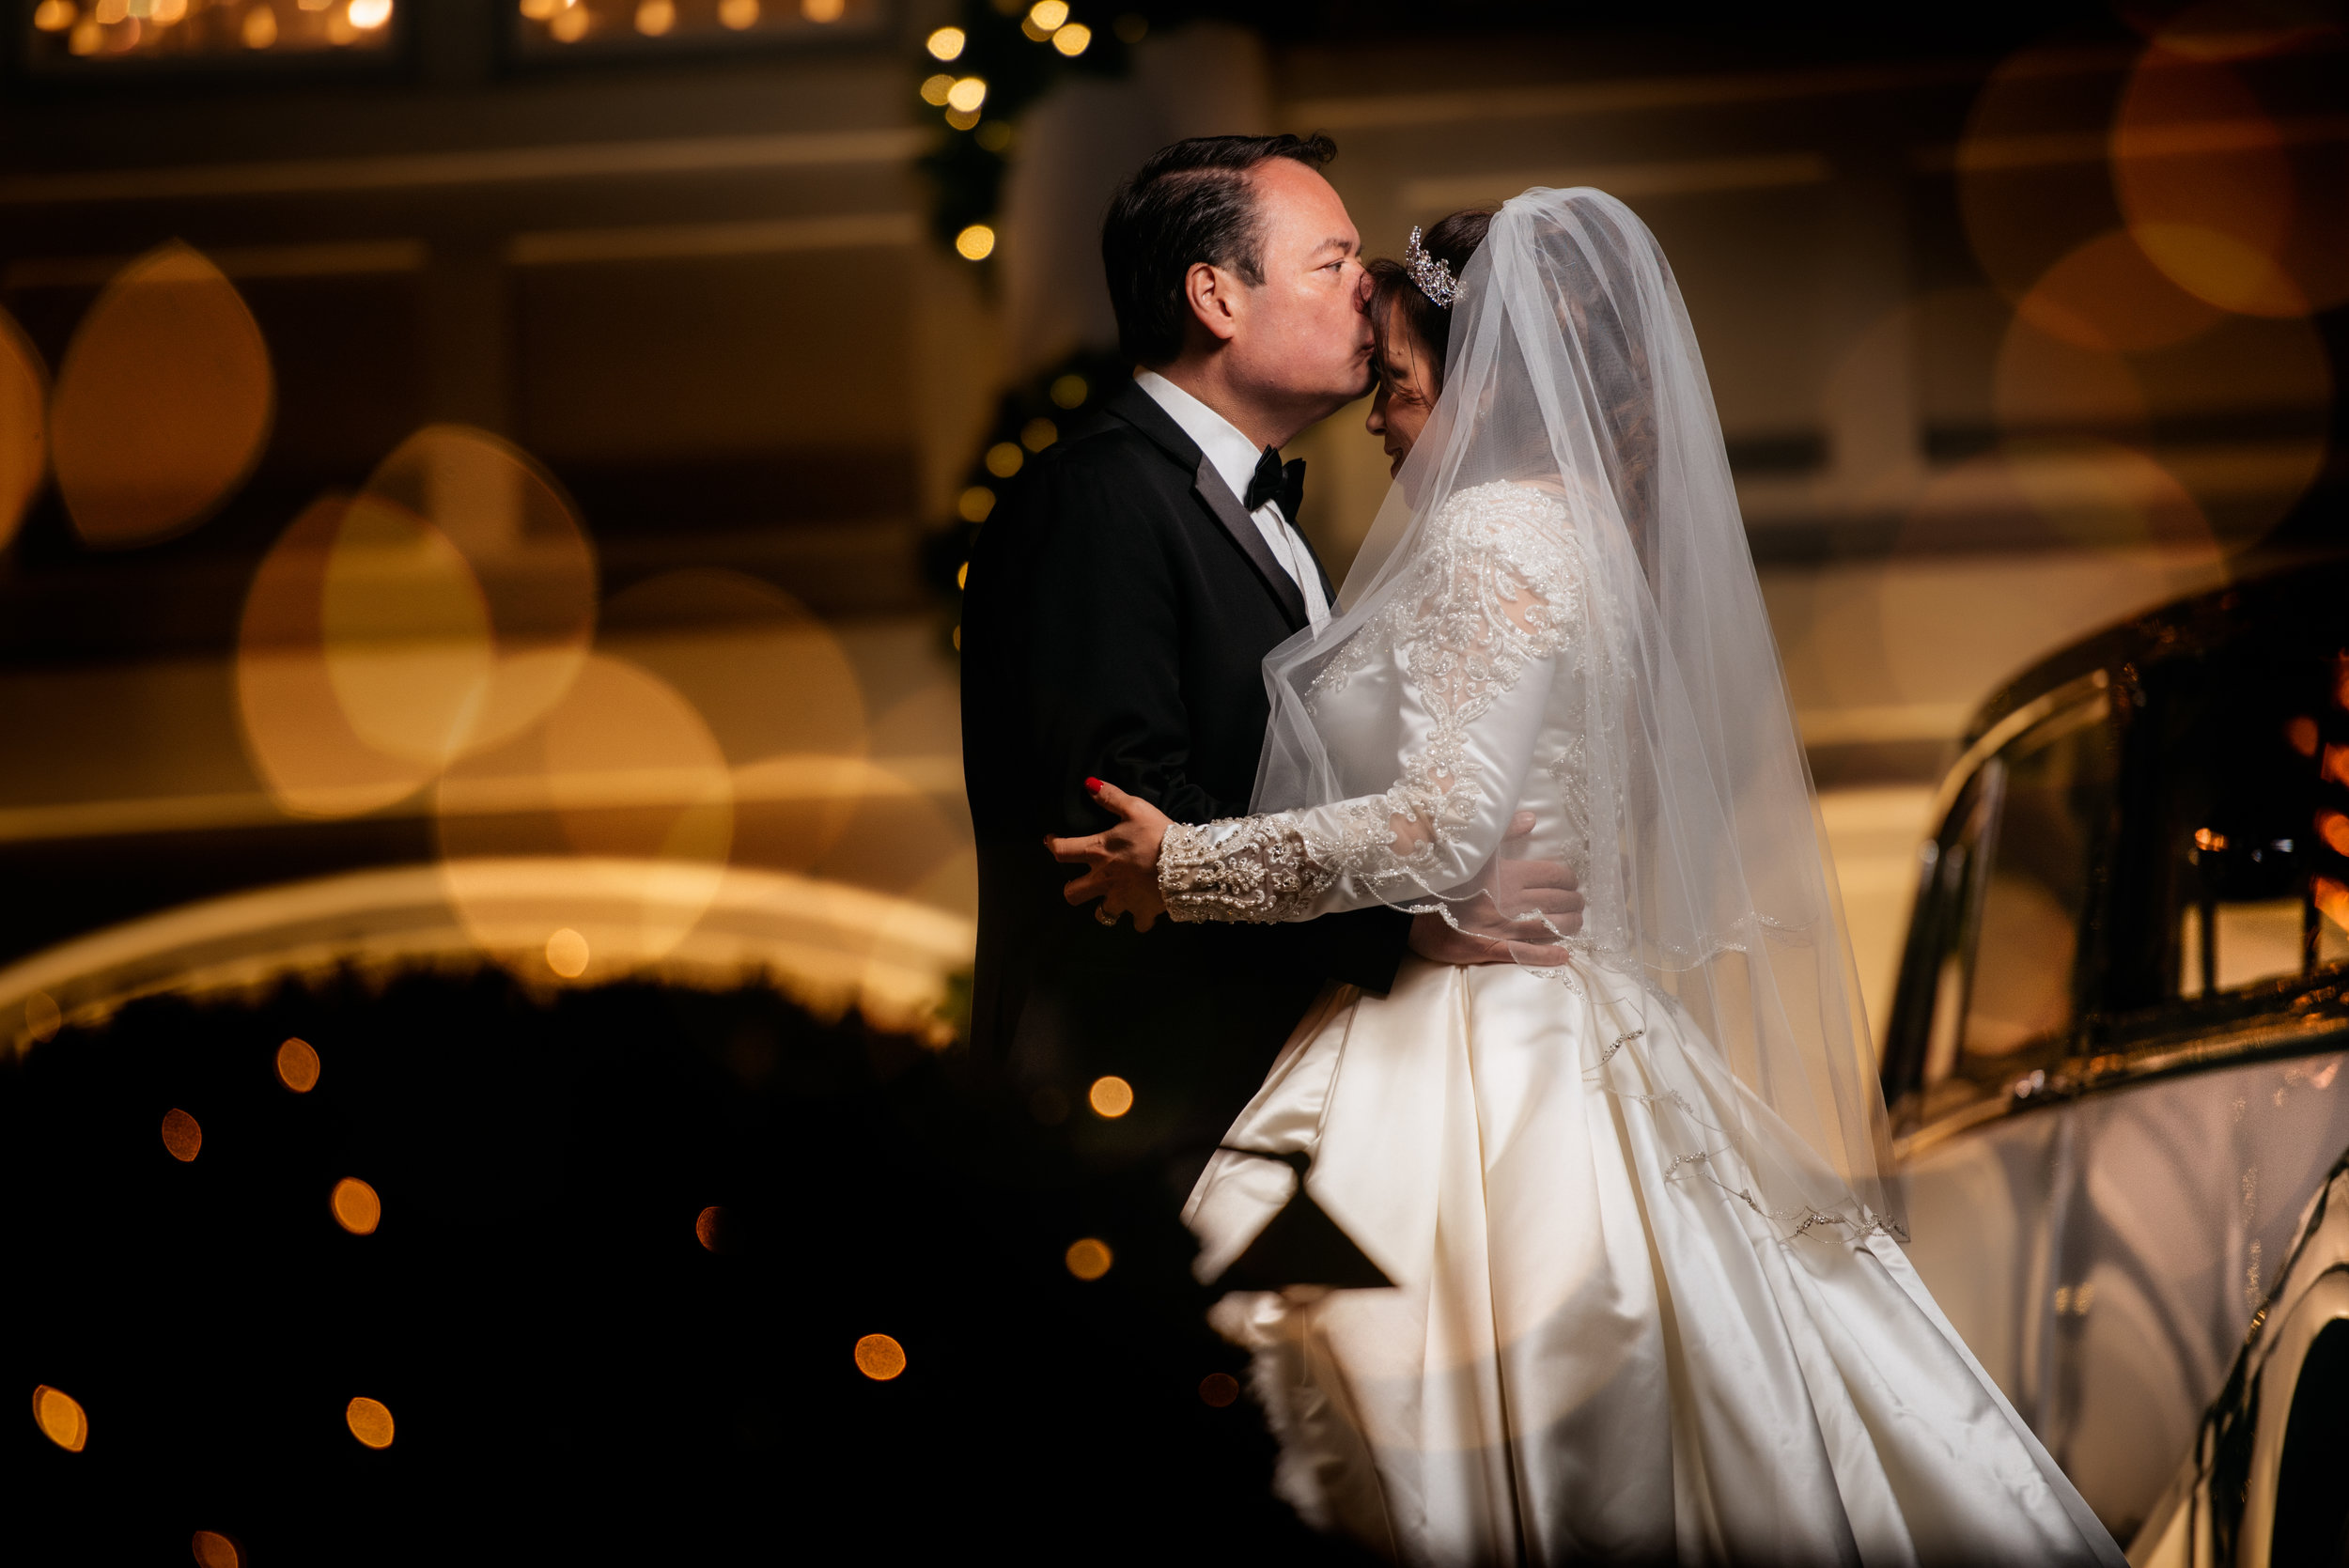 WeddingPhotos | NJPhotographer | Highlights-3-53.jpg